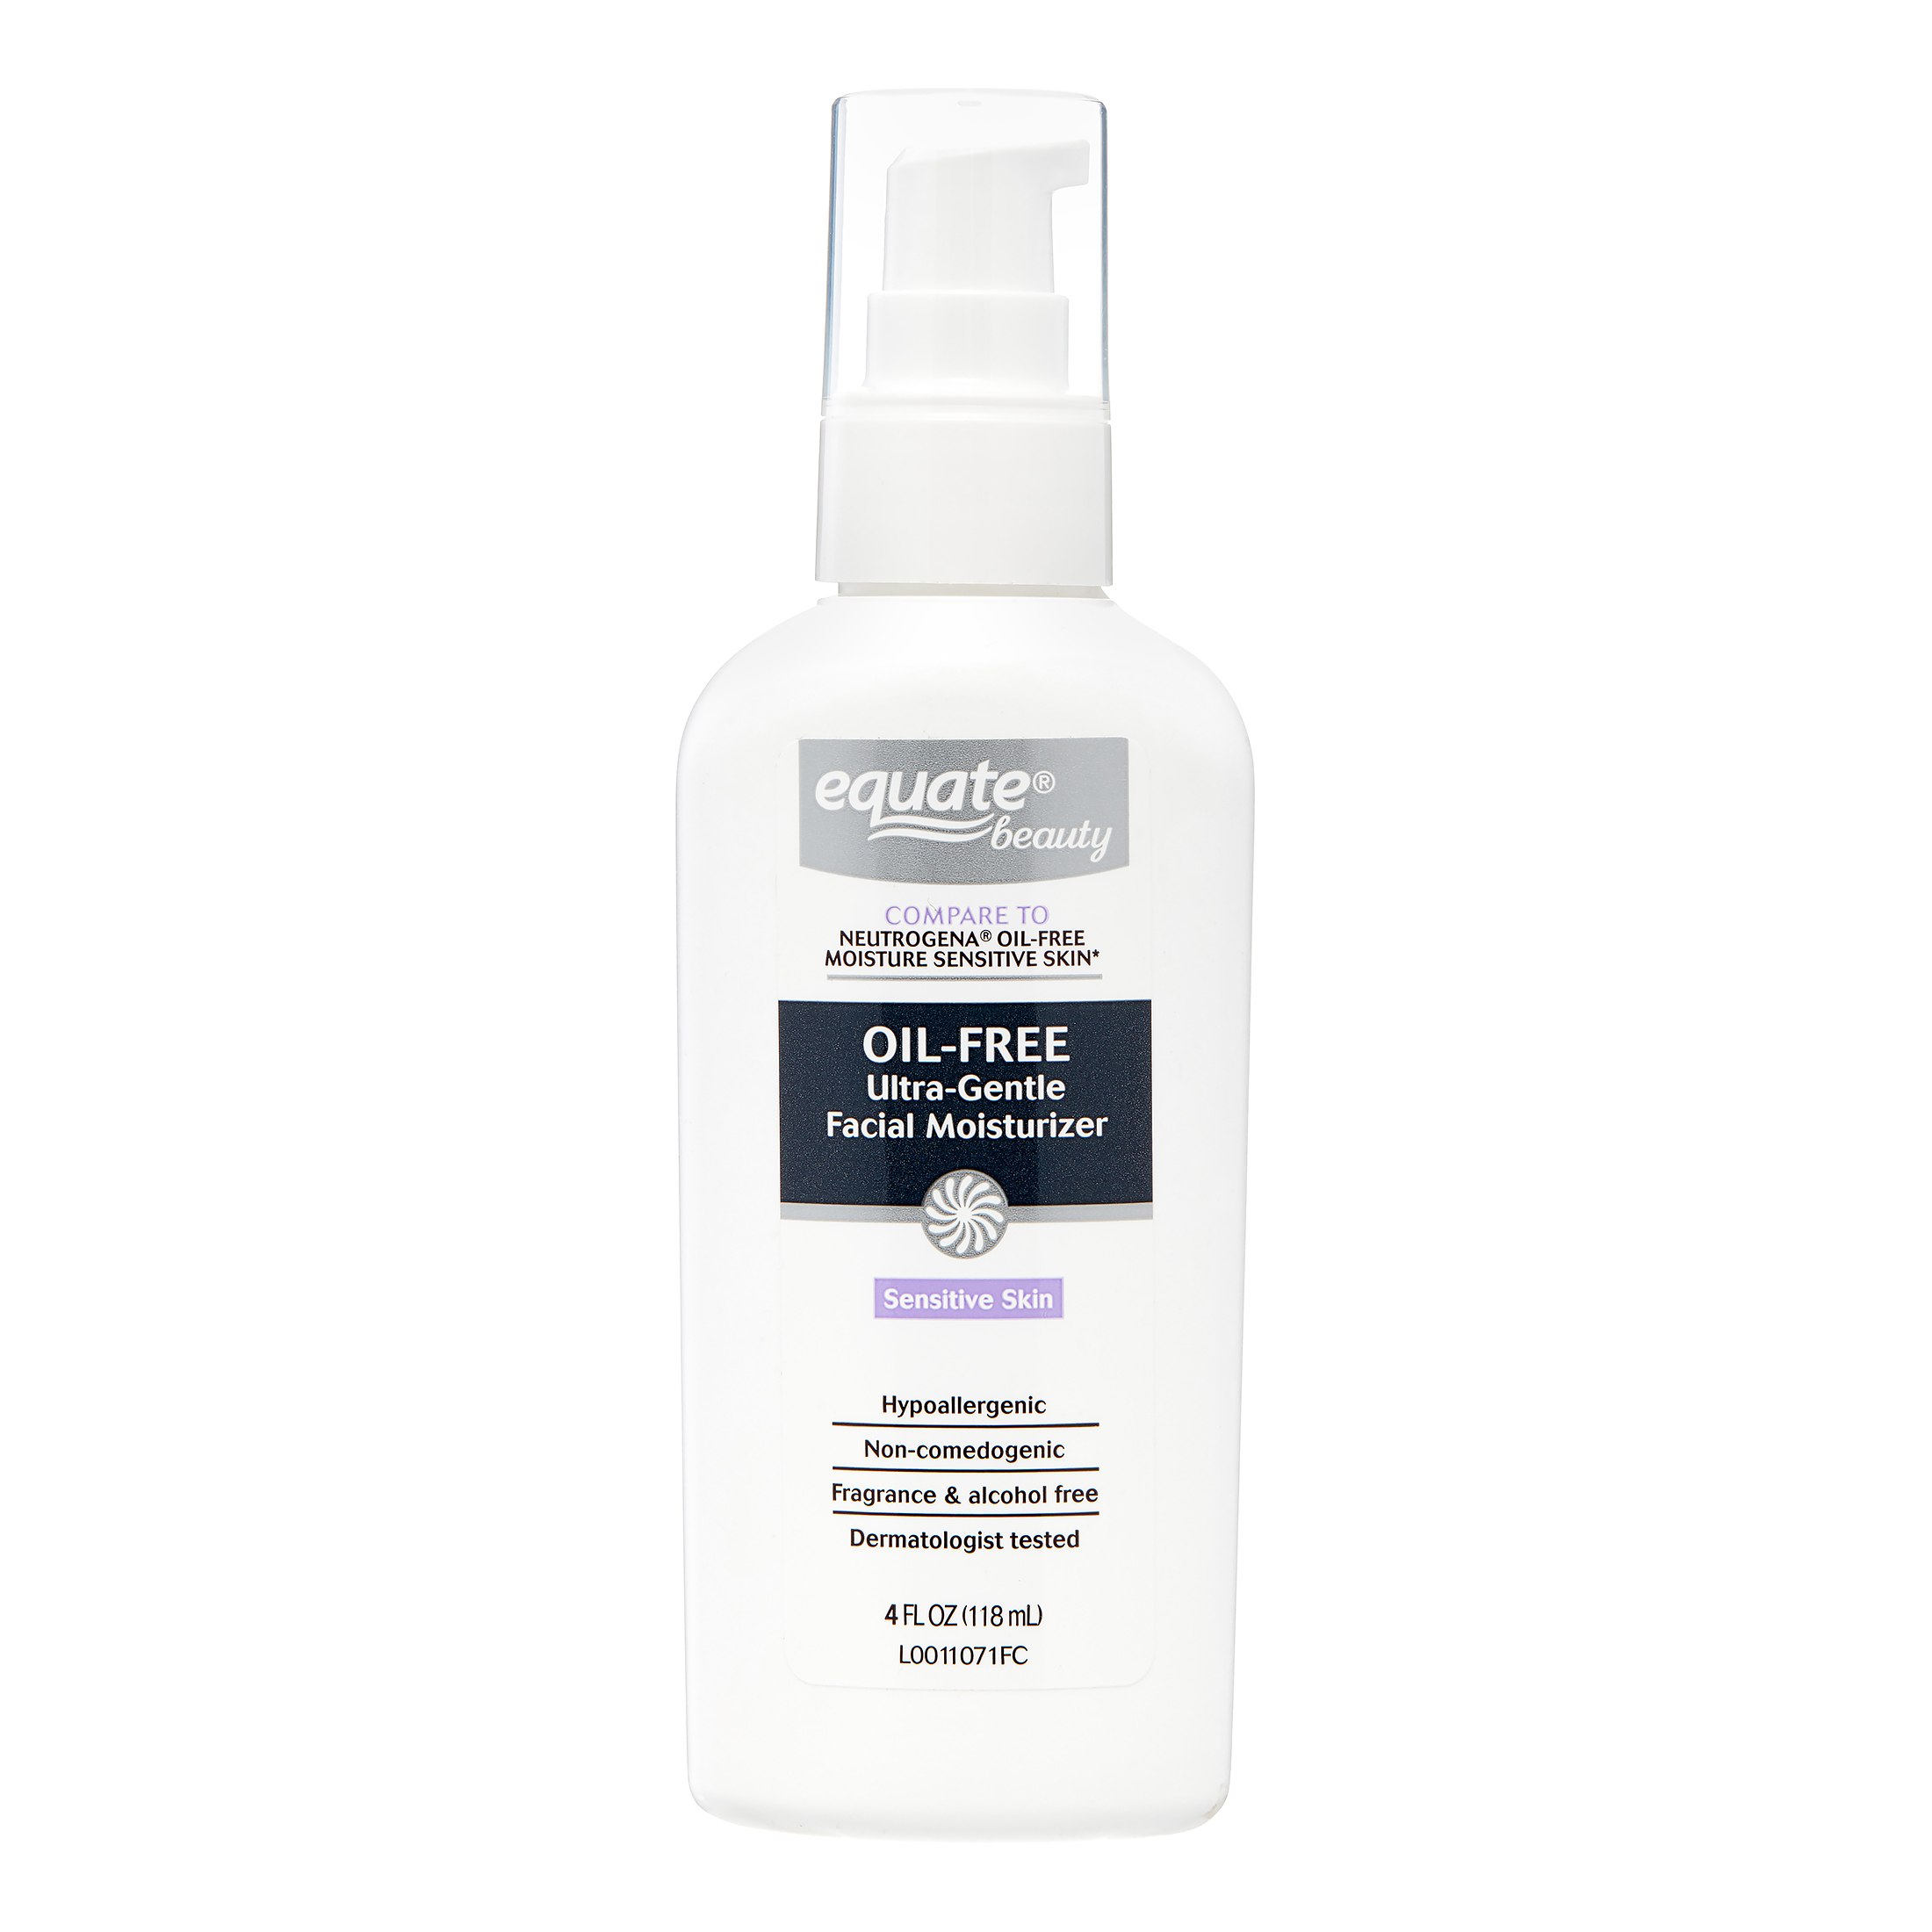 Equate Beauty Oil-Free Ultra-Gentle Lotion Face Moisturizer, 6 Fl Oz